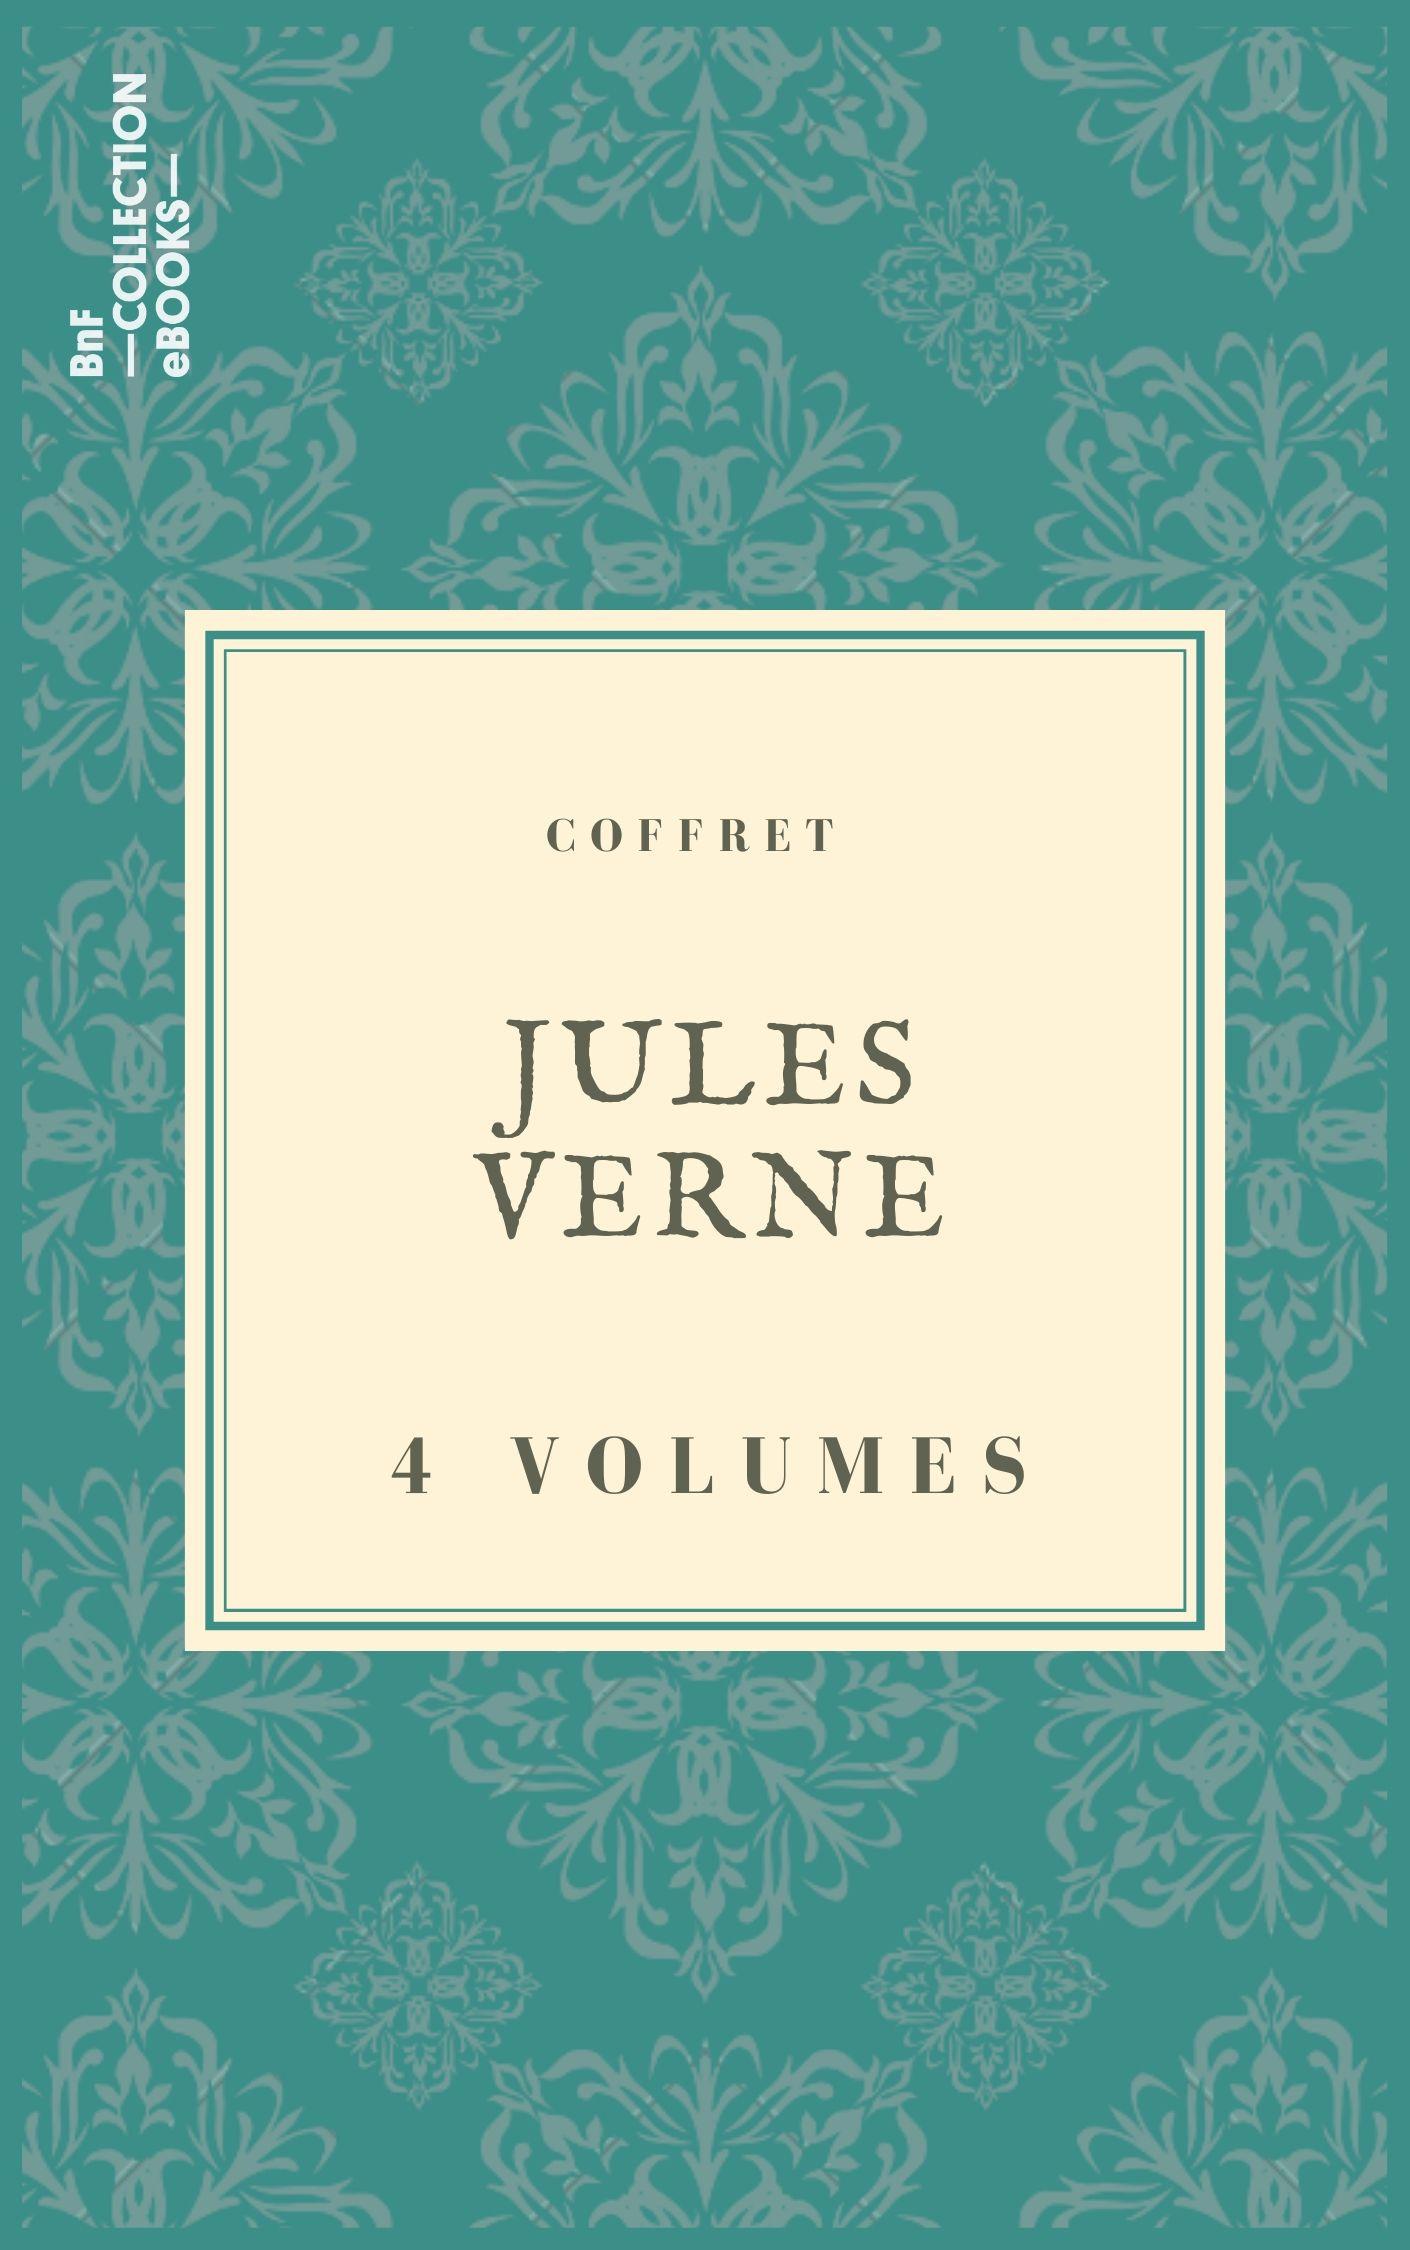 Coffret Jules Verne